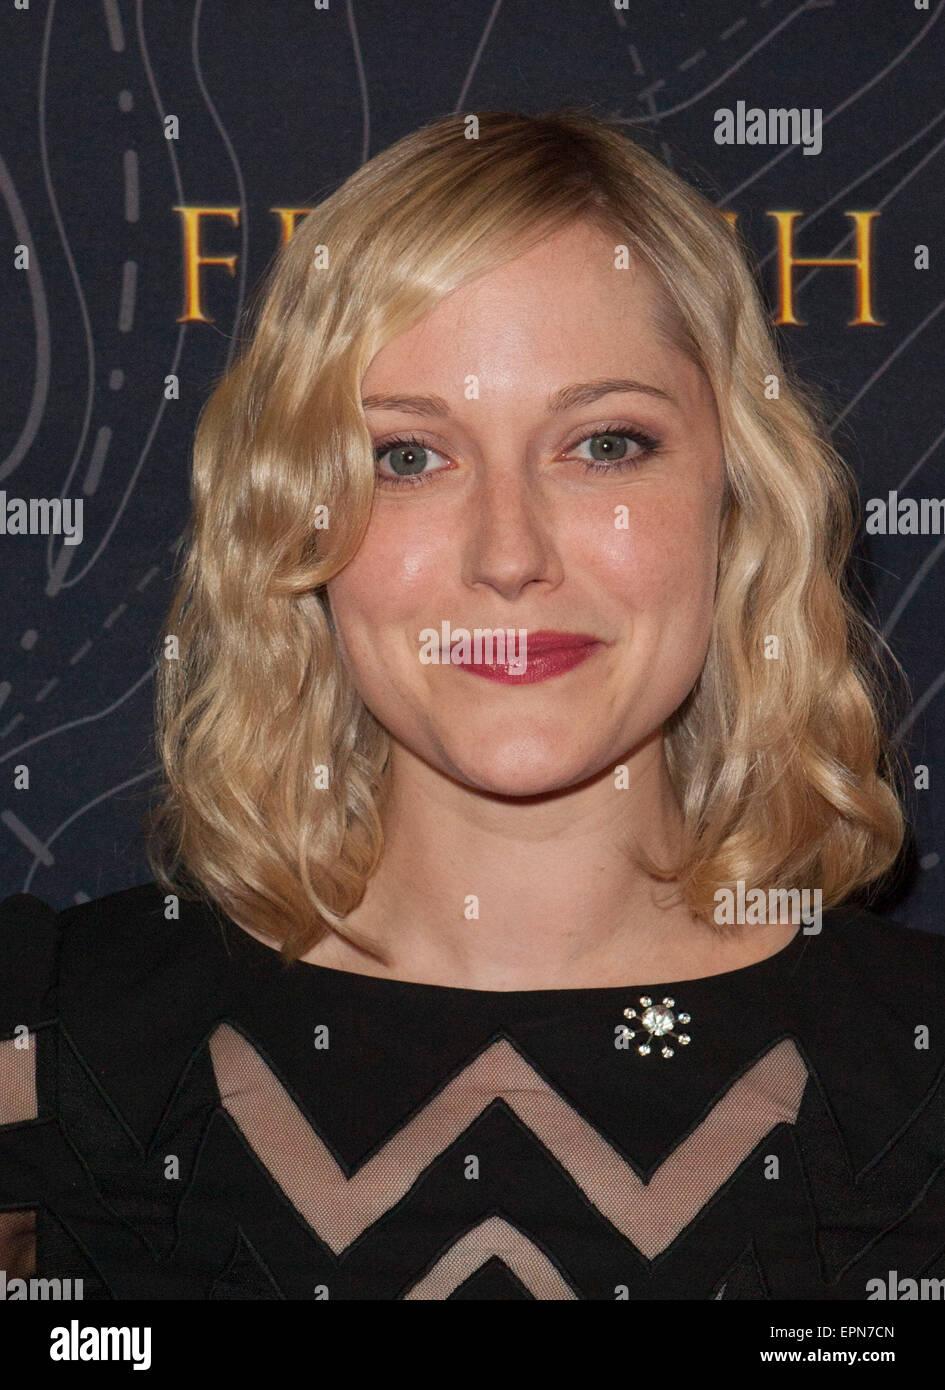 Los Angeles, California, USA. 19th May, 2015. Georgina Haig arrives at the 'French Kiss'' Film Premiere - Stock Image